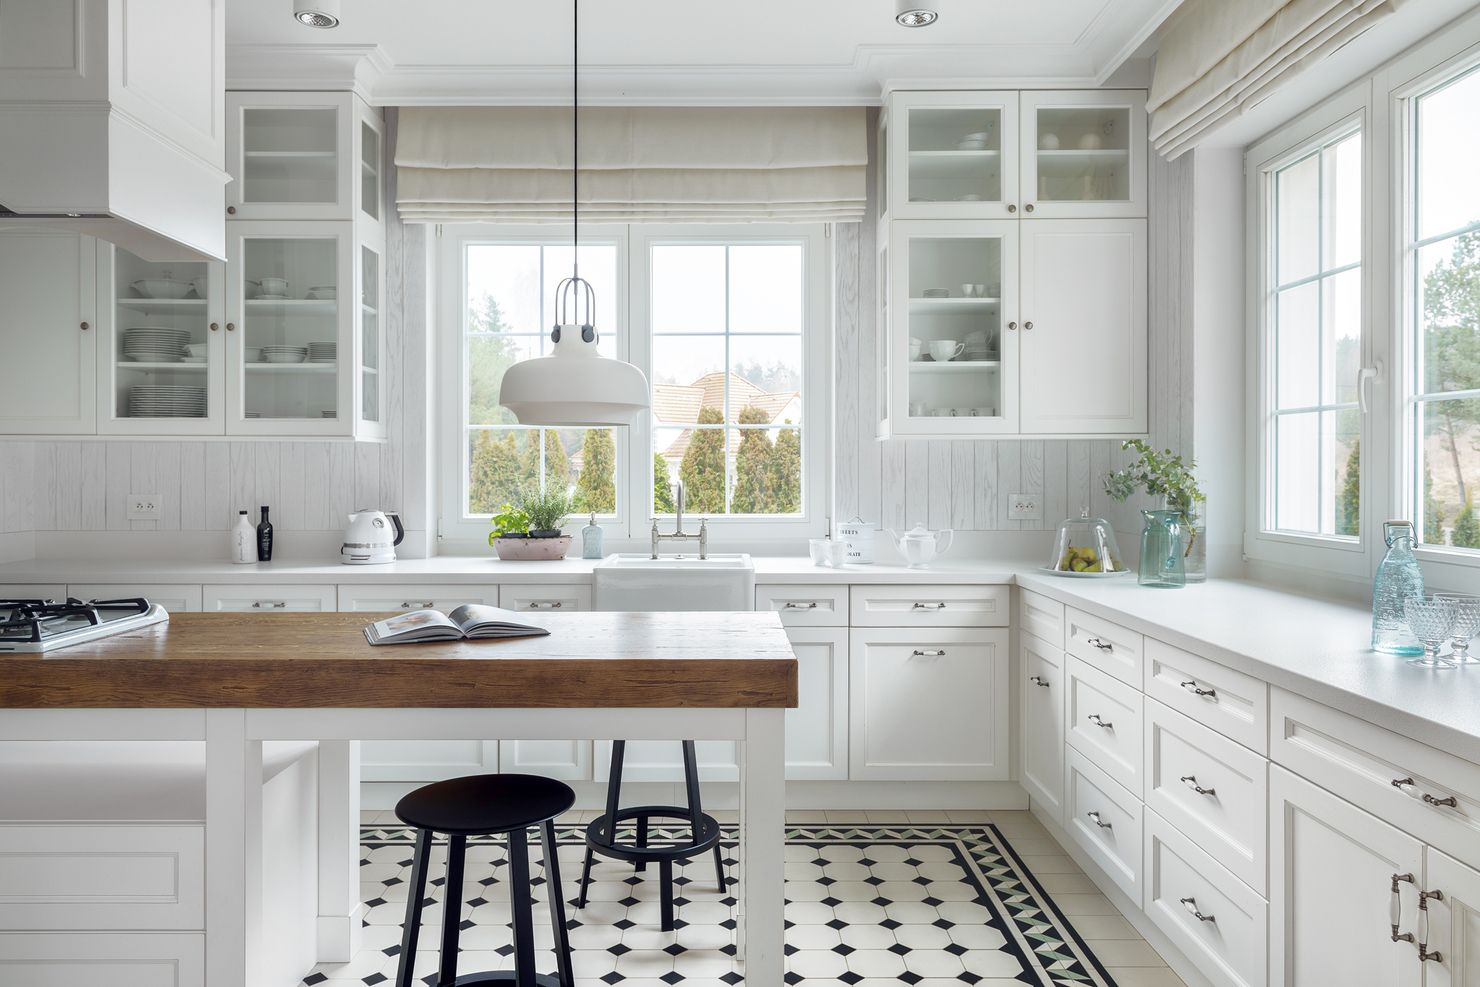 http bajkowewnetrza blogspot co uk 2016 04 klasyczne wnetrze z nutka roman glass kitchen on kitchen cabinets with glass doors on top id=88706